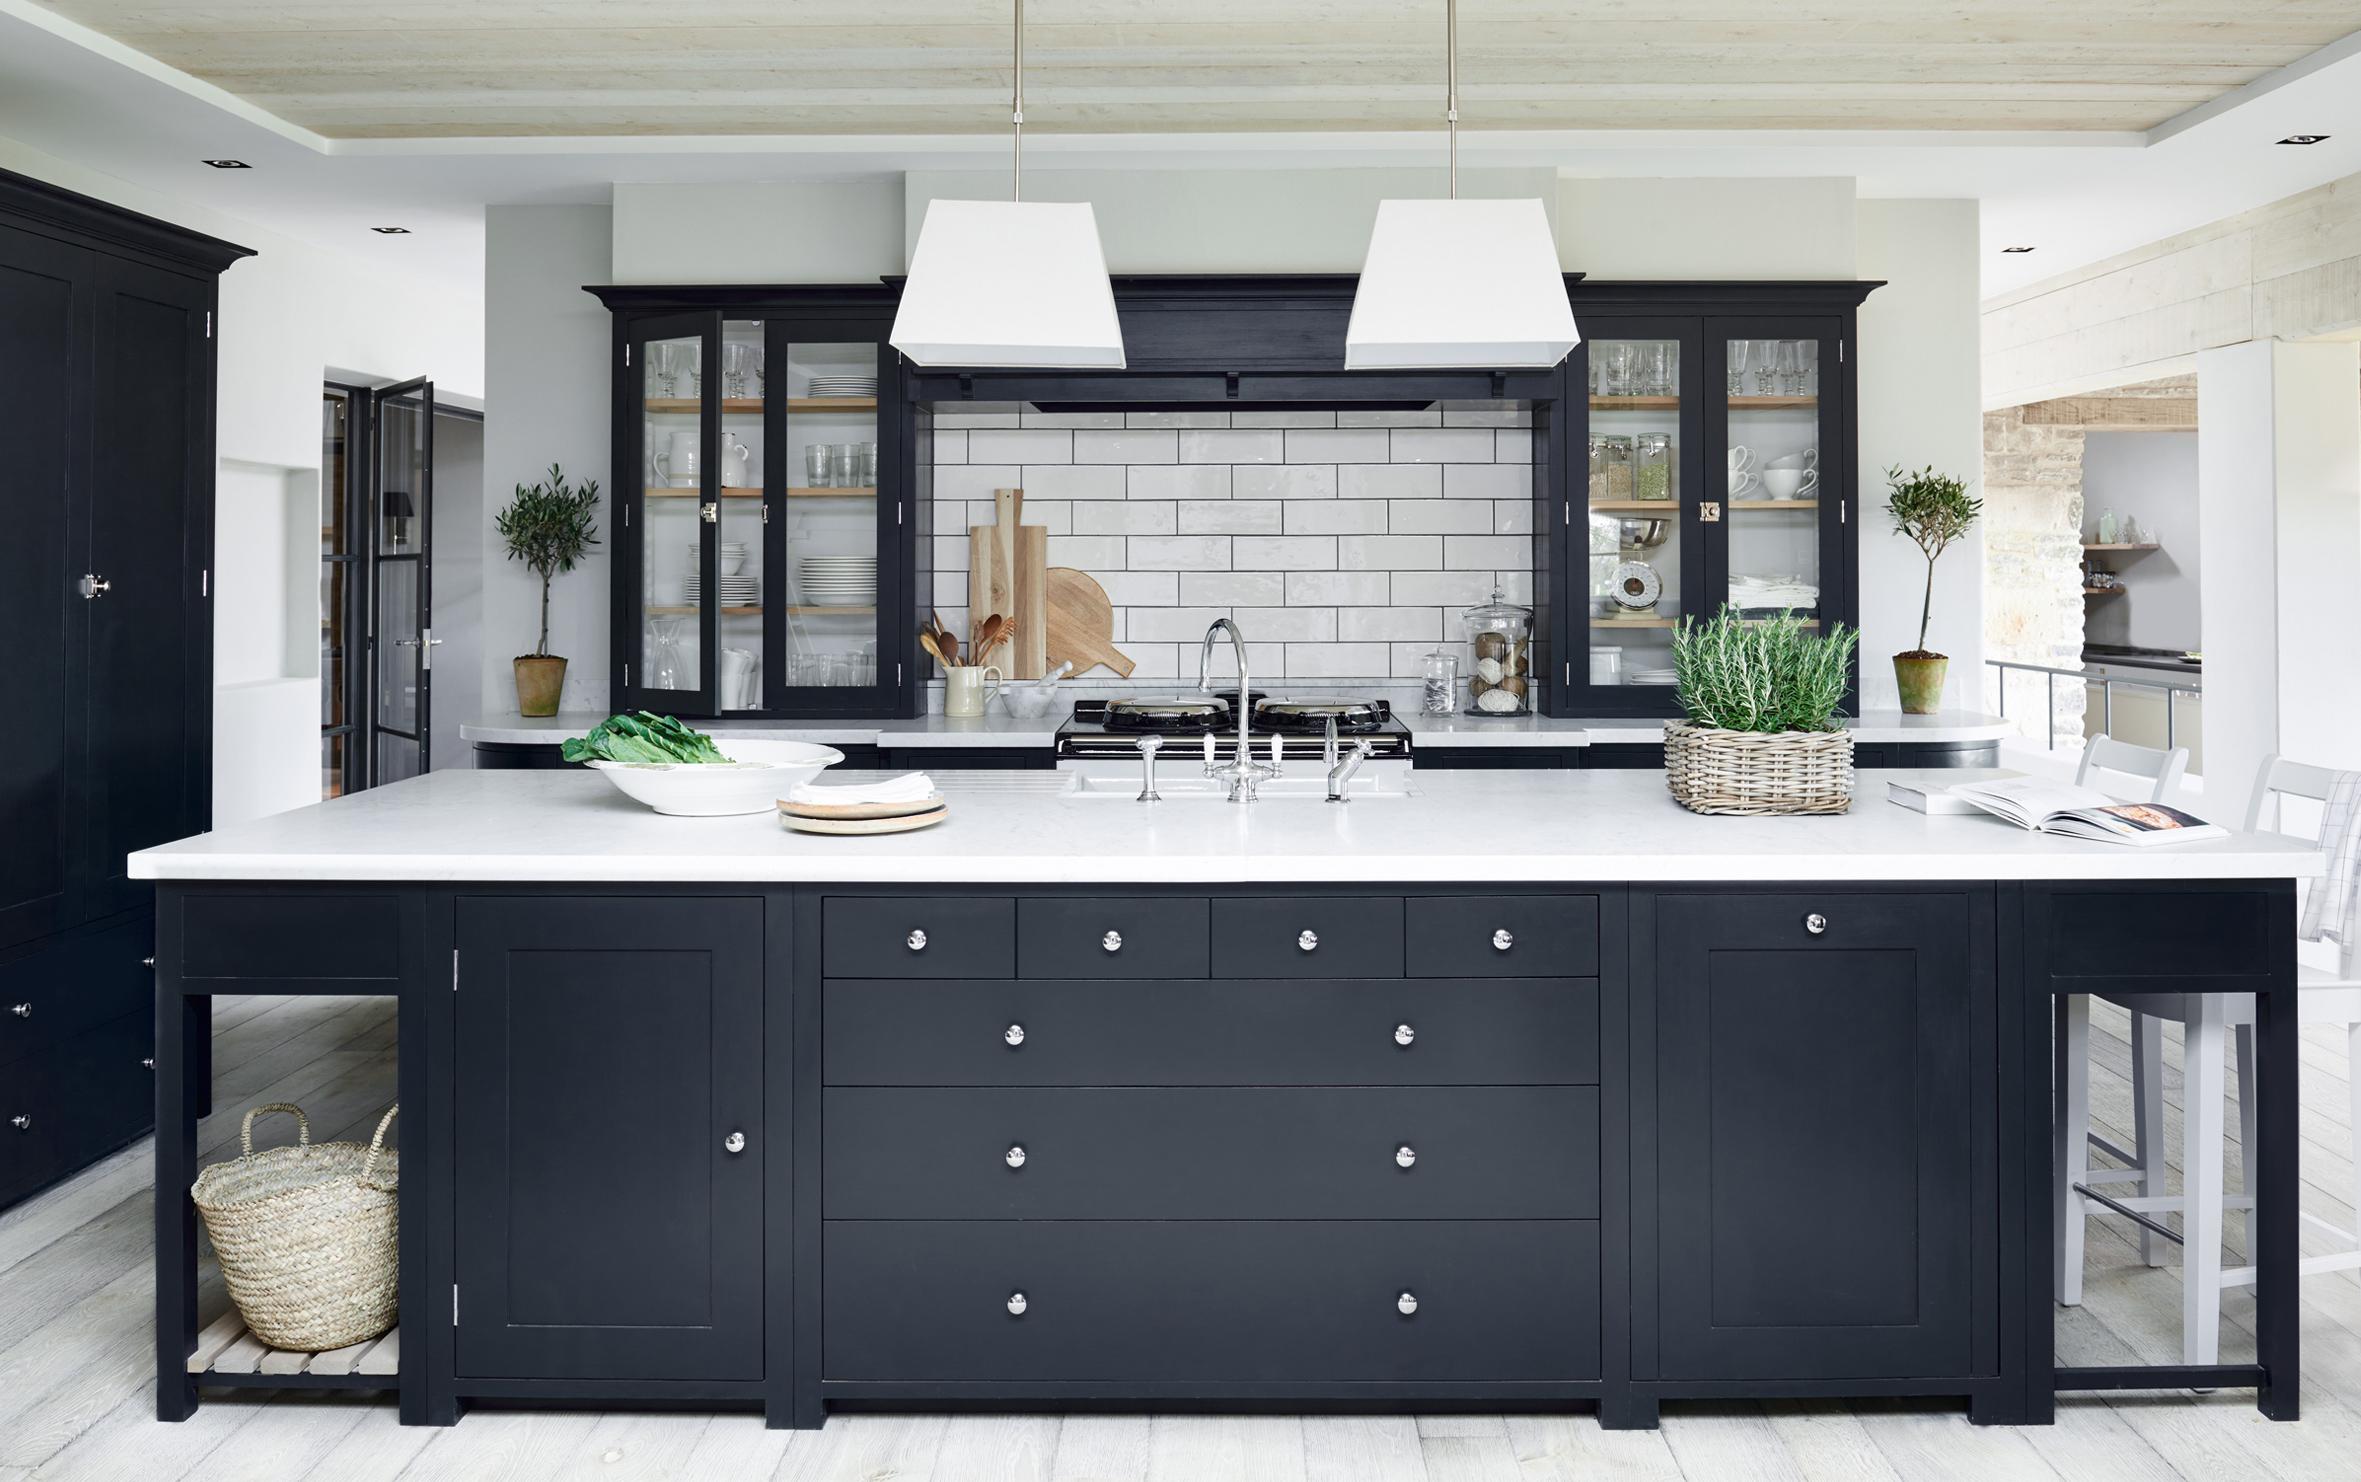 common errors in kitchen design 5 اشتباهات دکوراسیون آشپزخانه